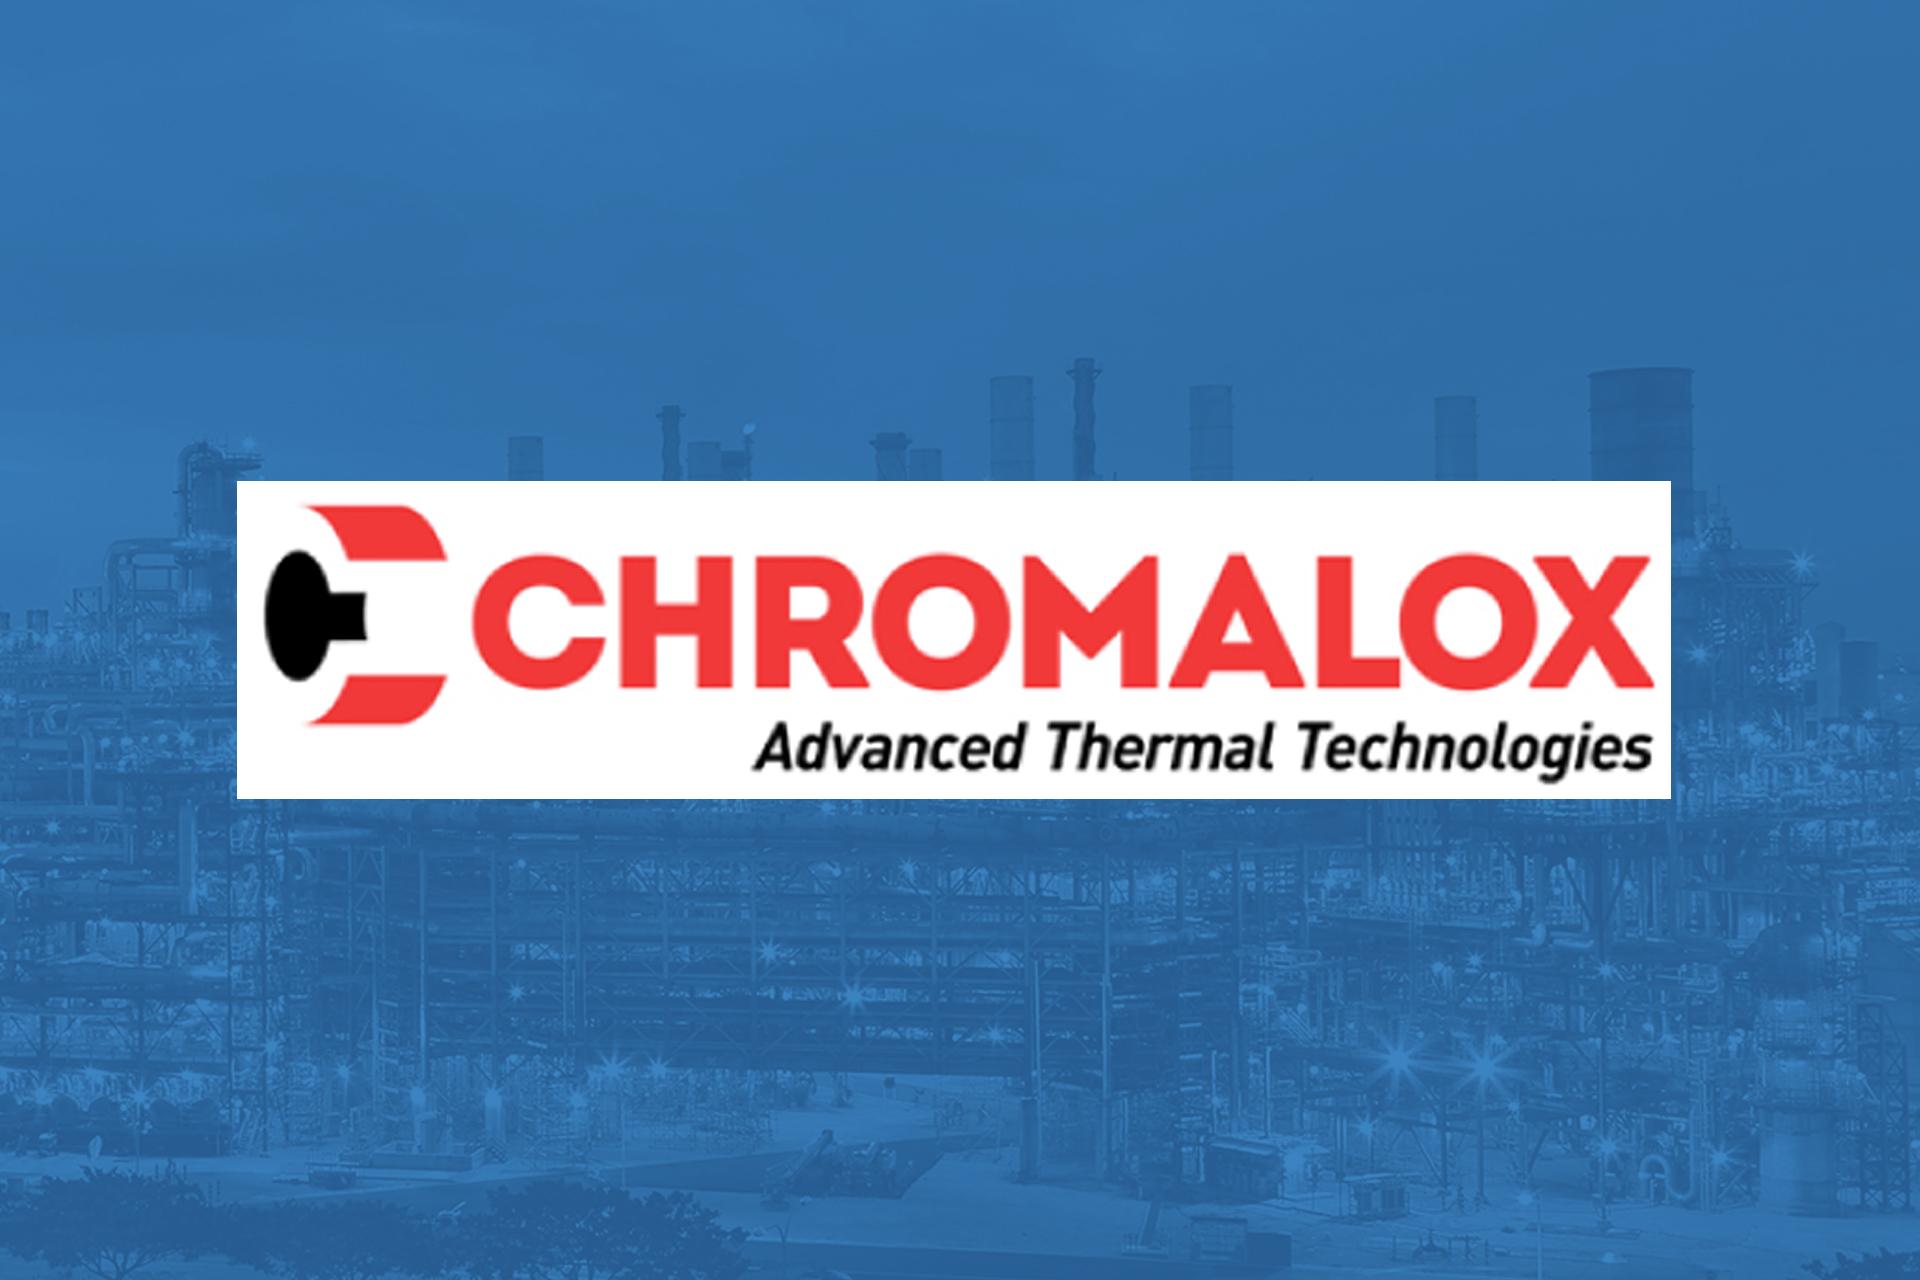 ChromaloxSlide